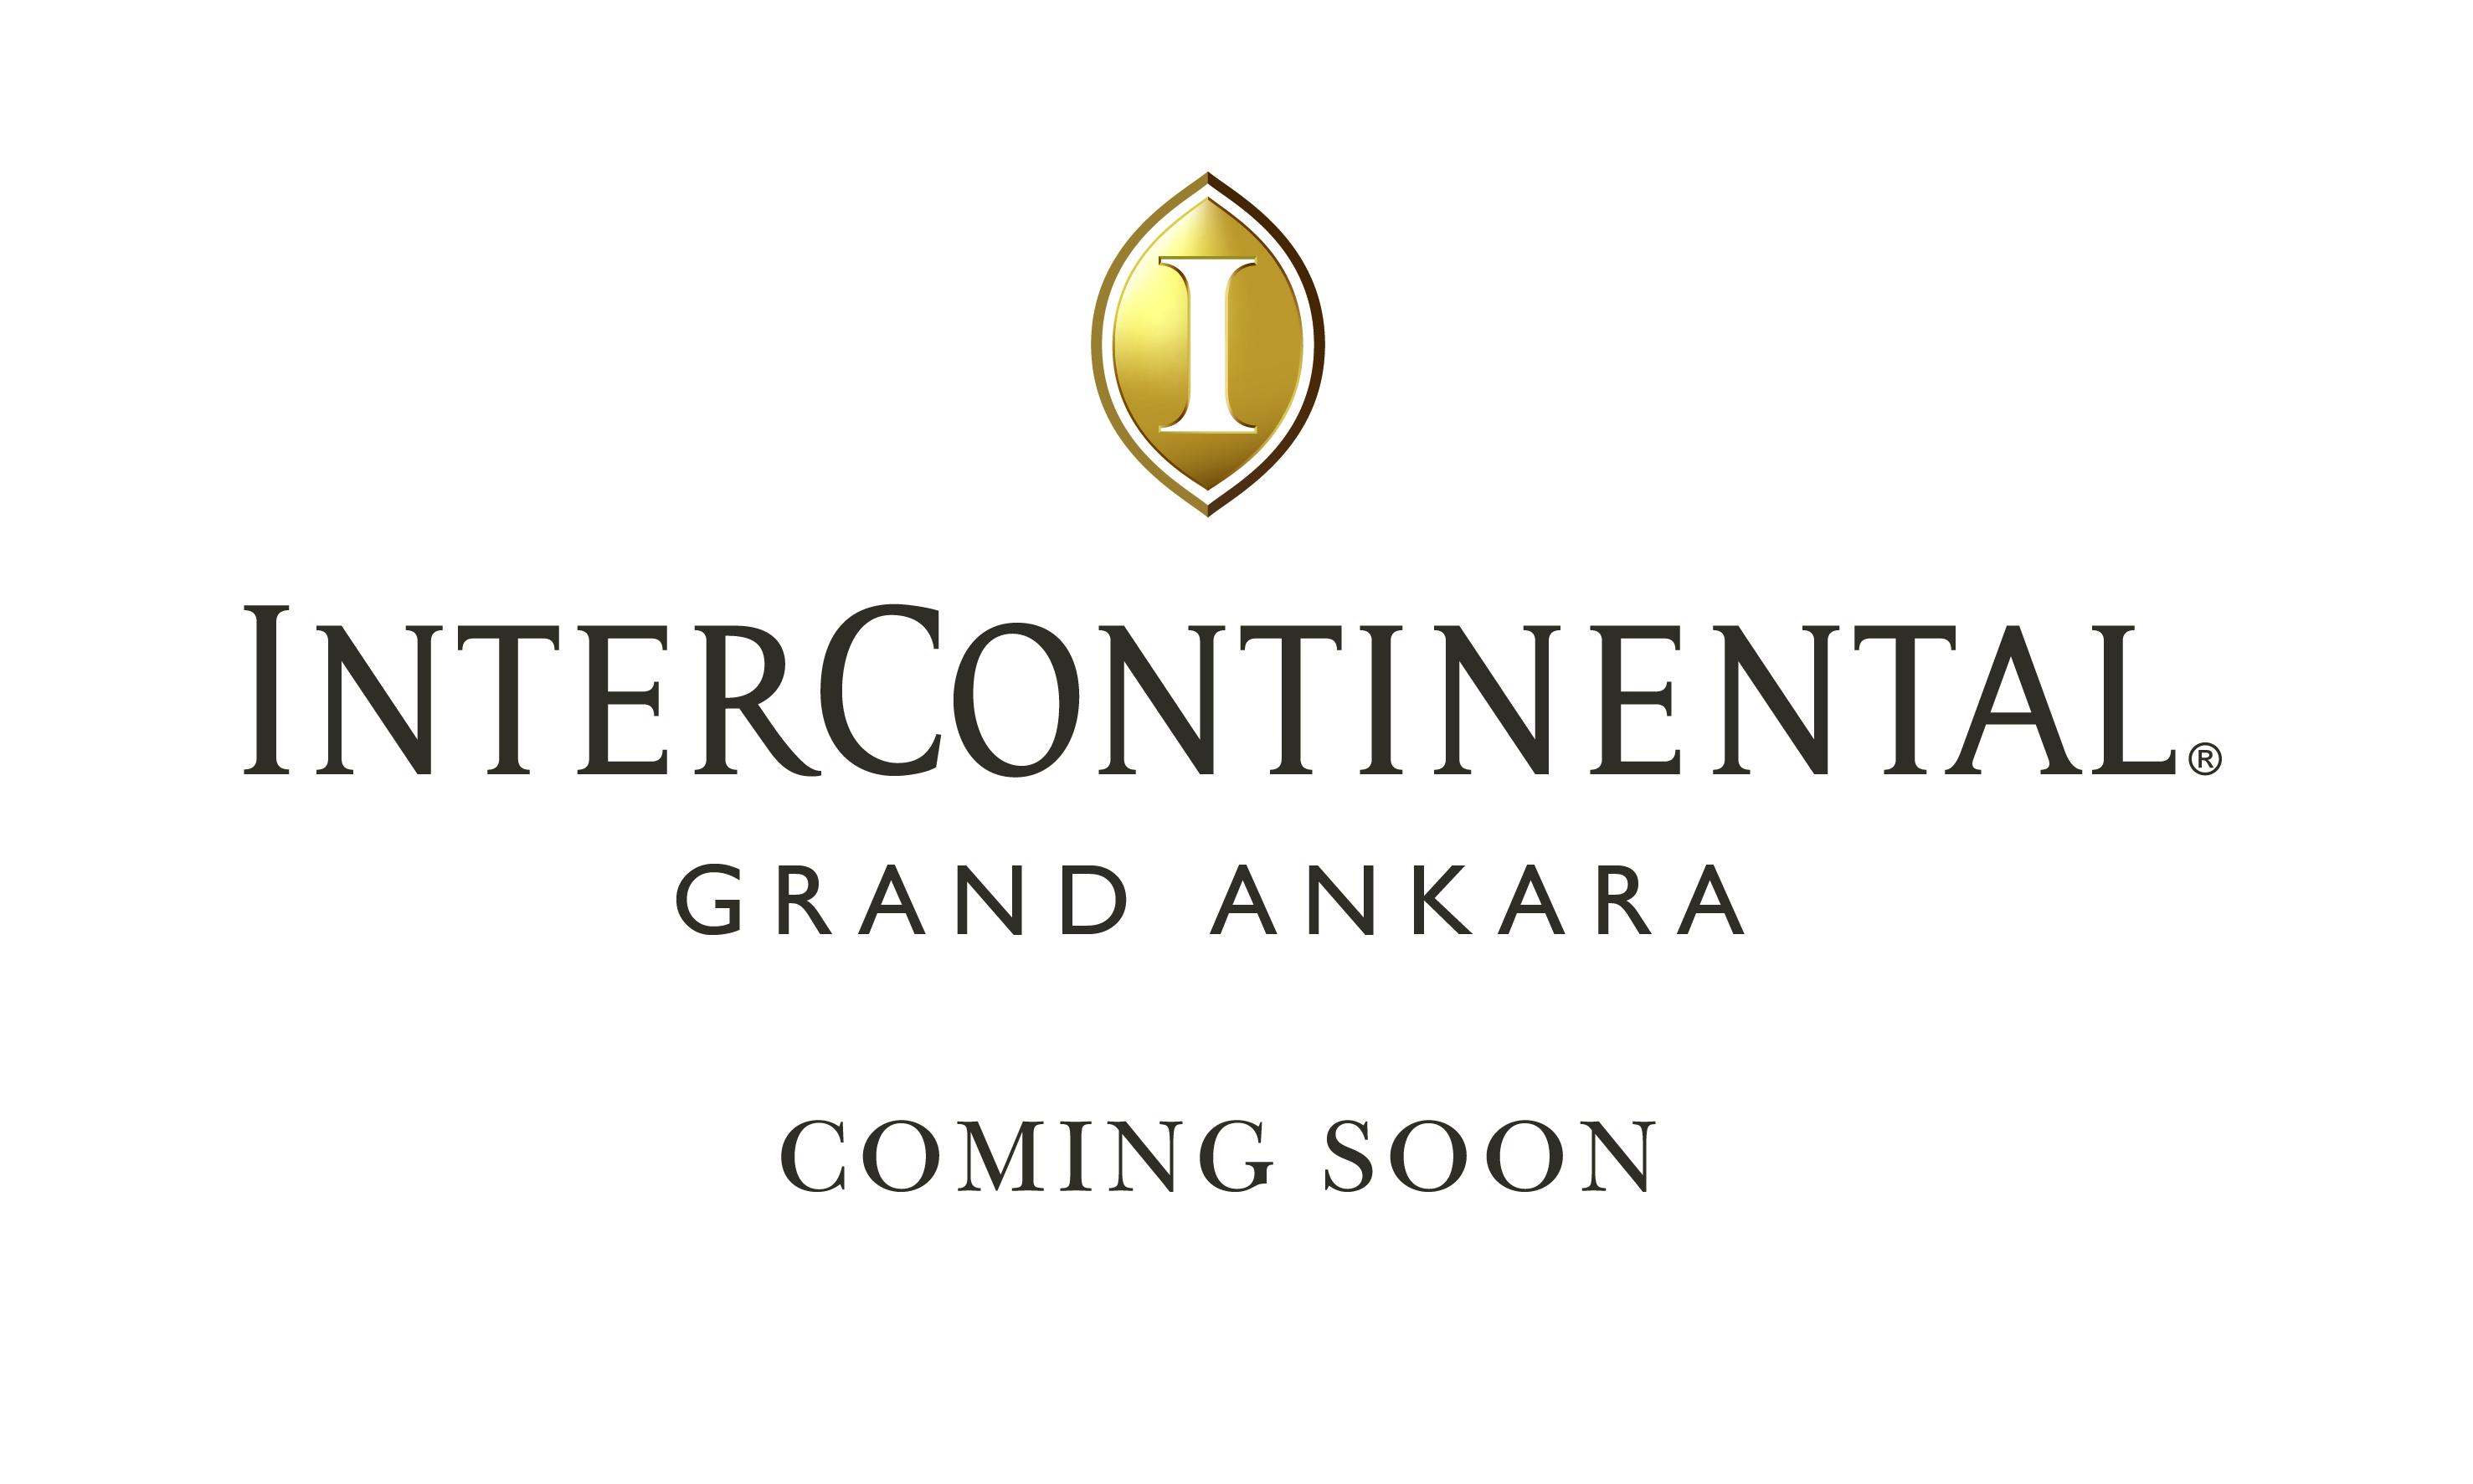 Intercontinental Coming Soon